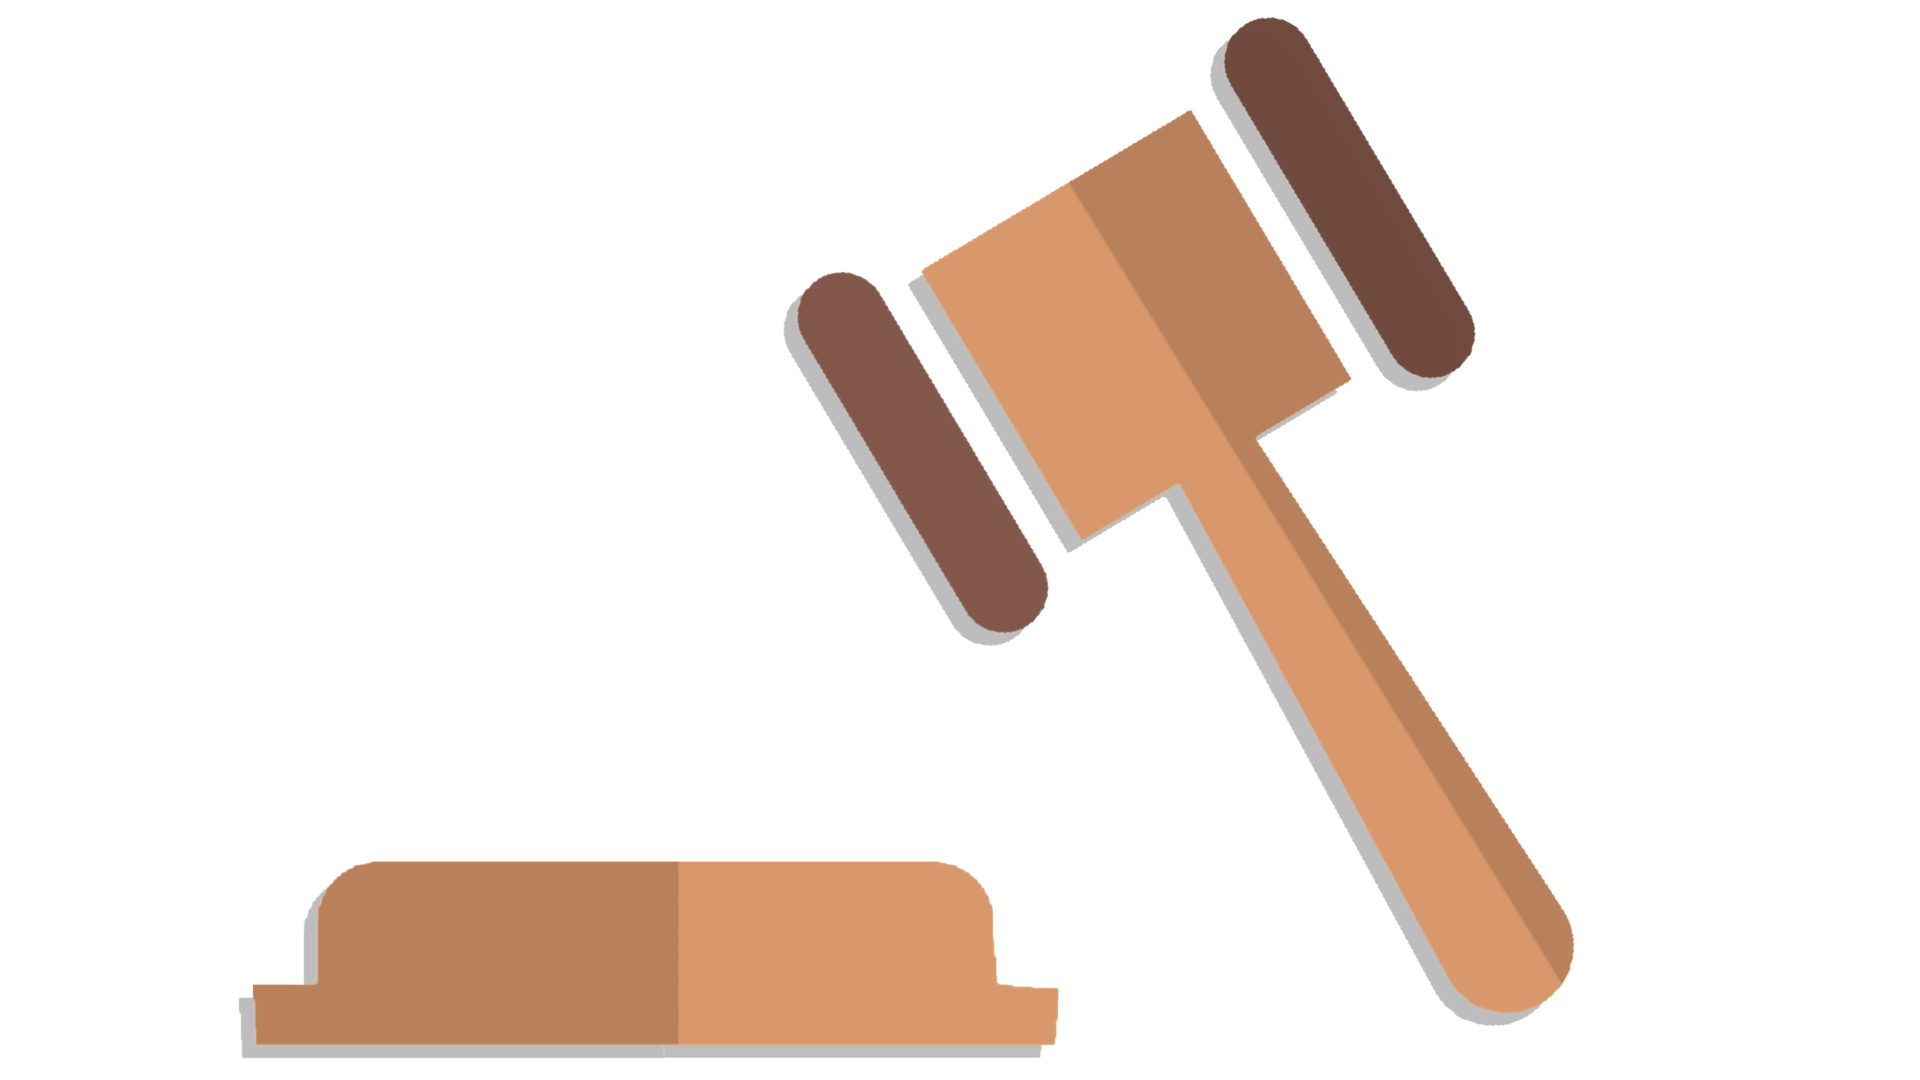 The Uniform Electronic Transactions Act (UETA) Law